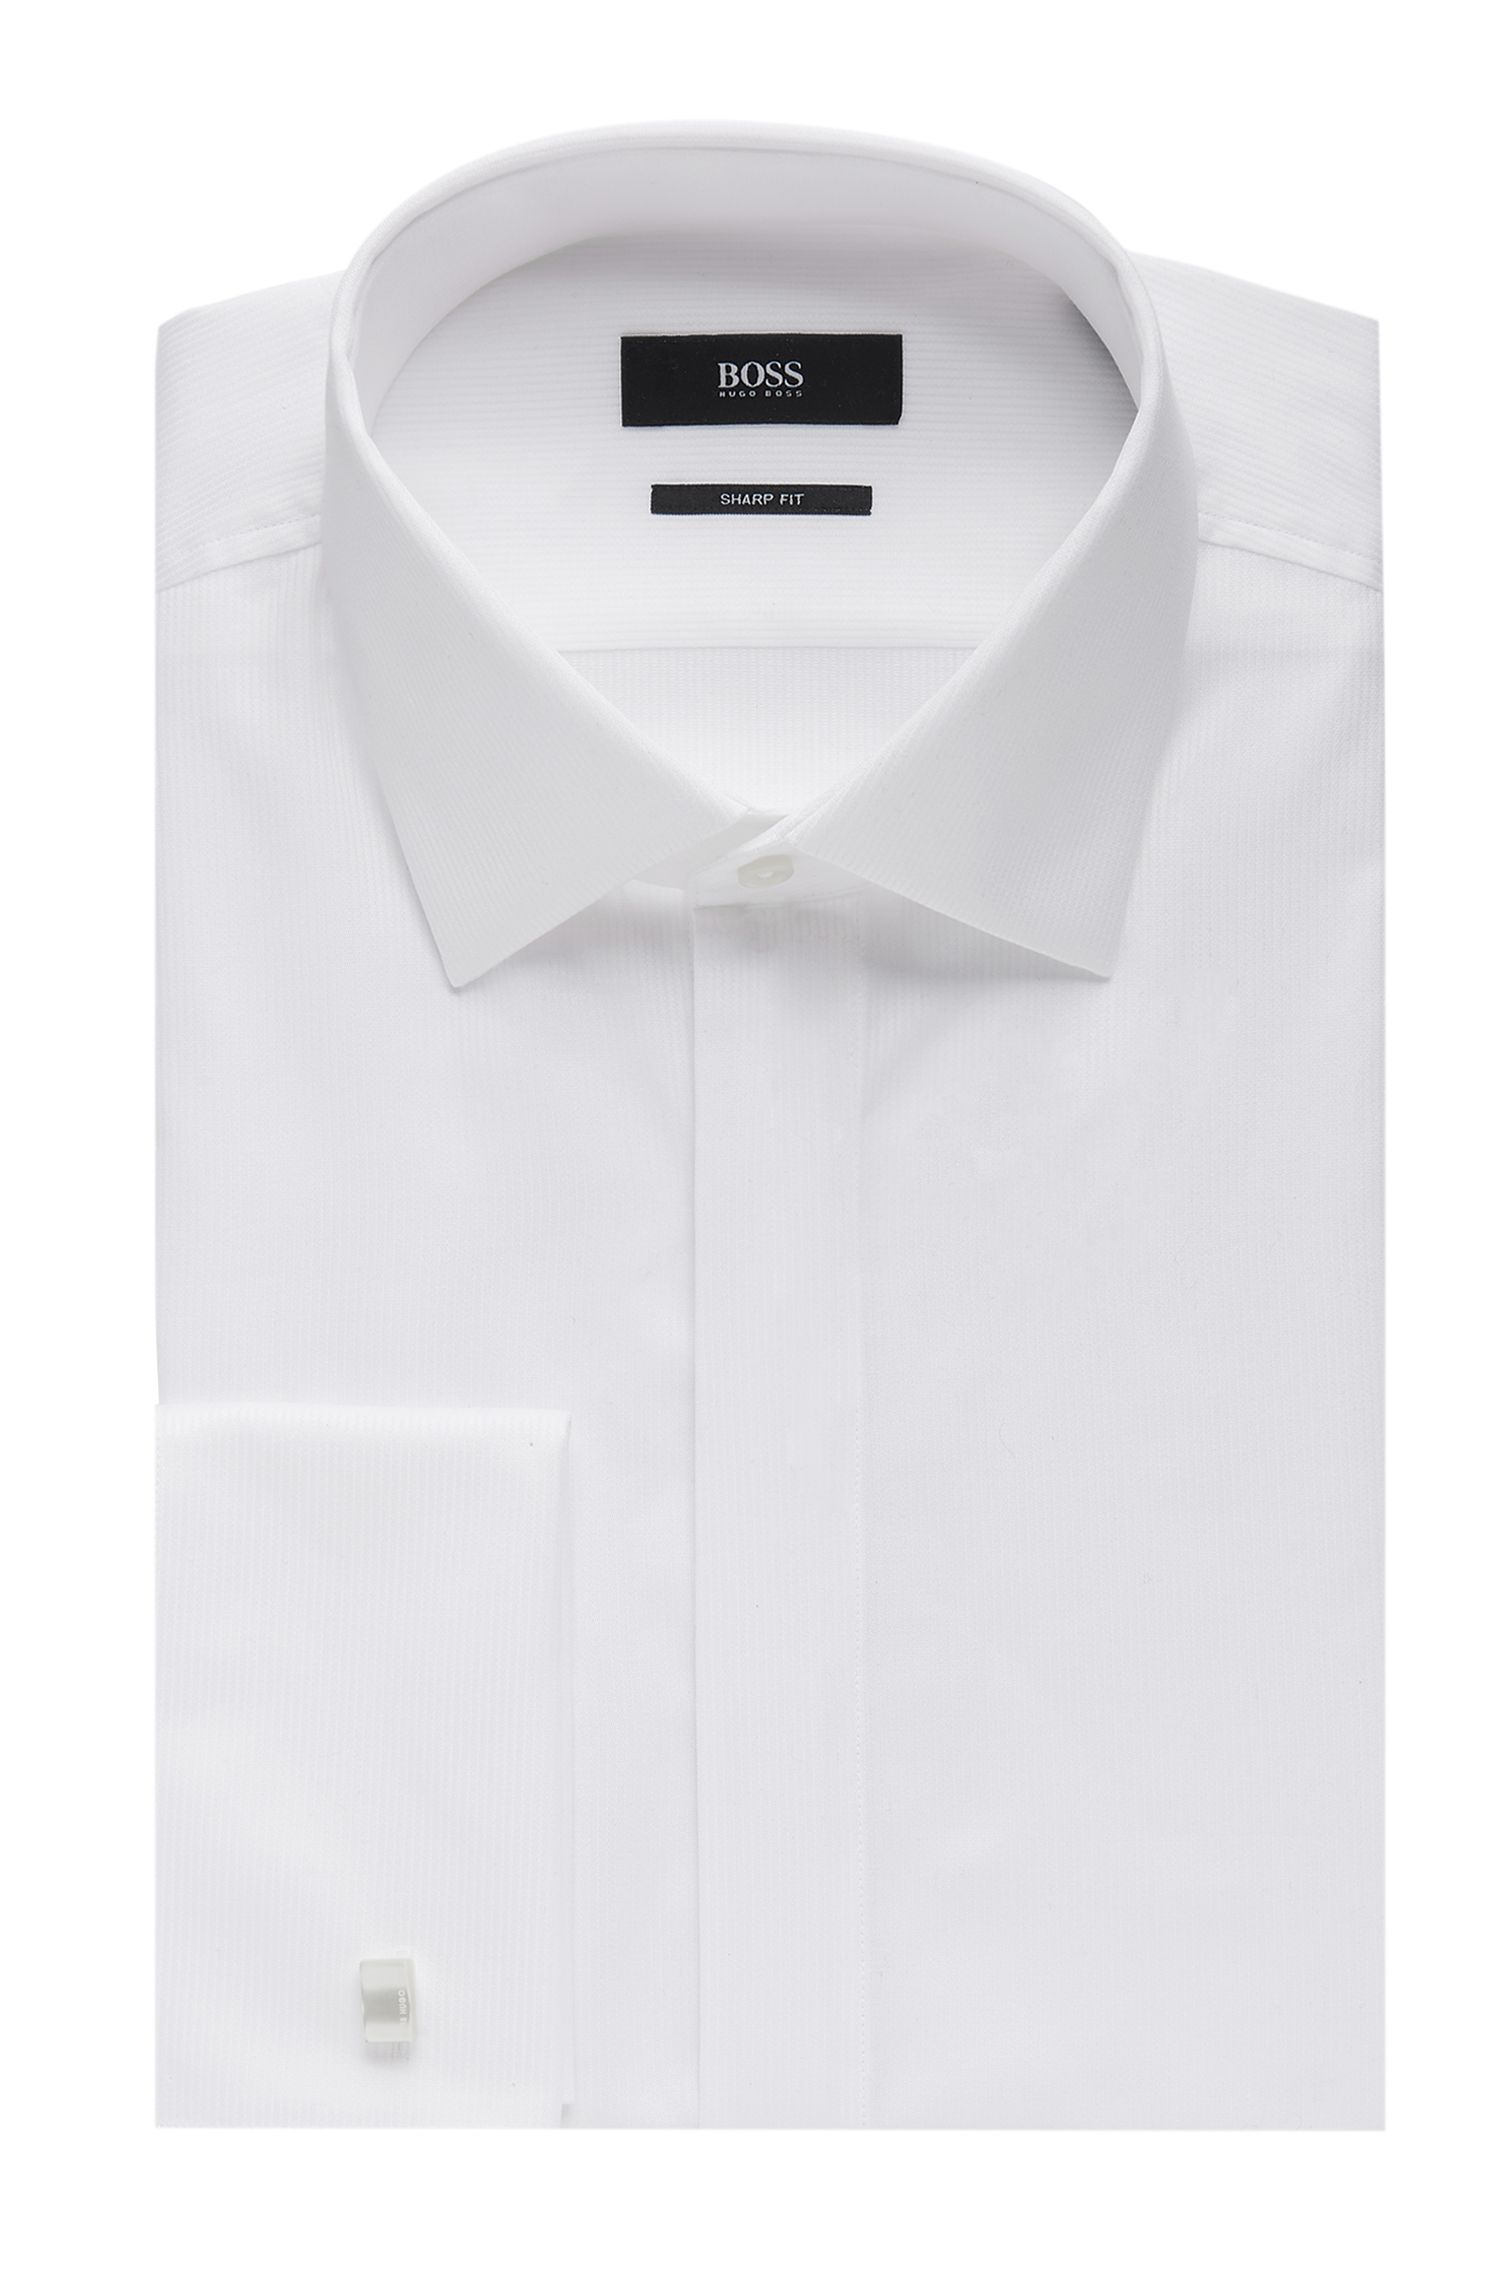 'Ismo' | Slim fit, French Cuff Pique Cotton Dress Shirt